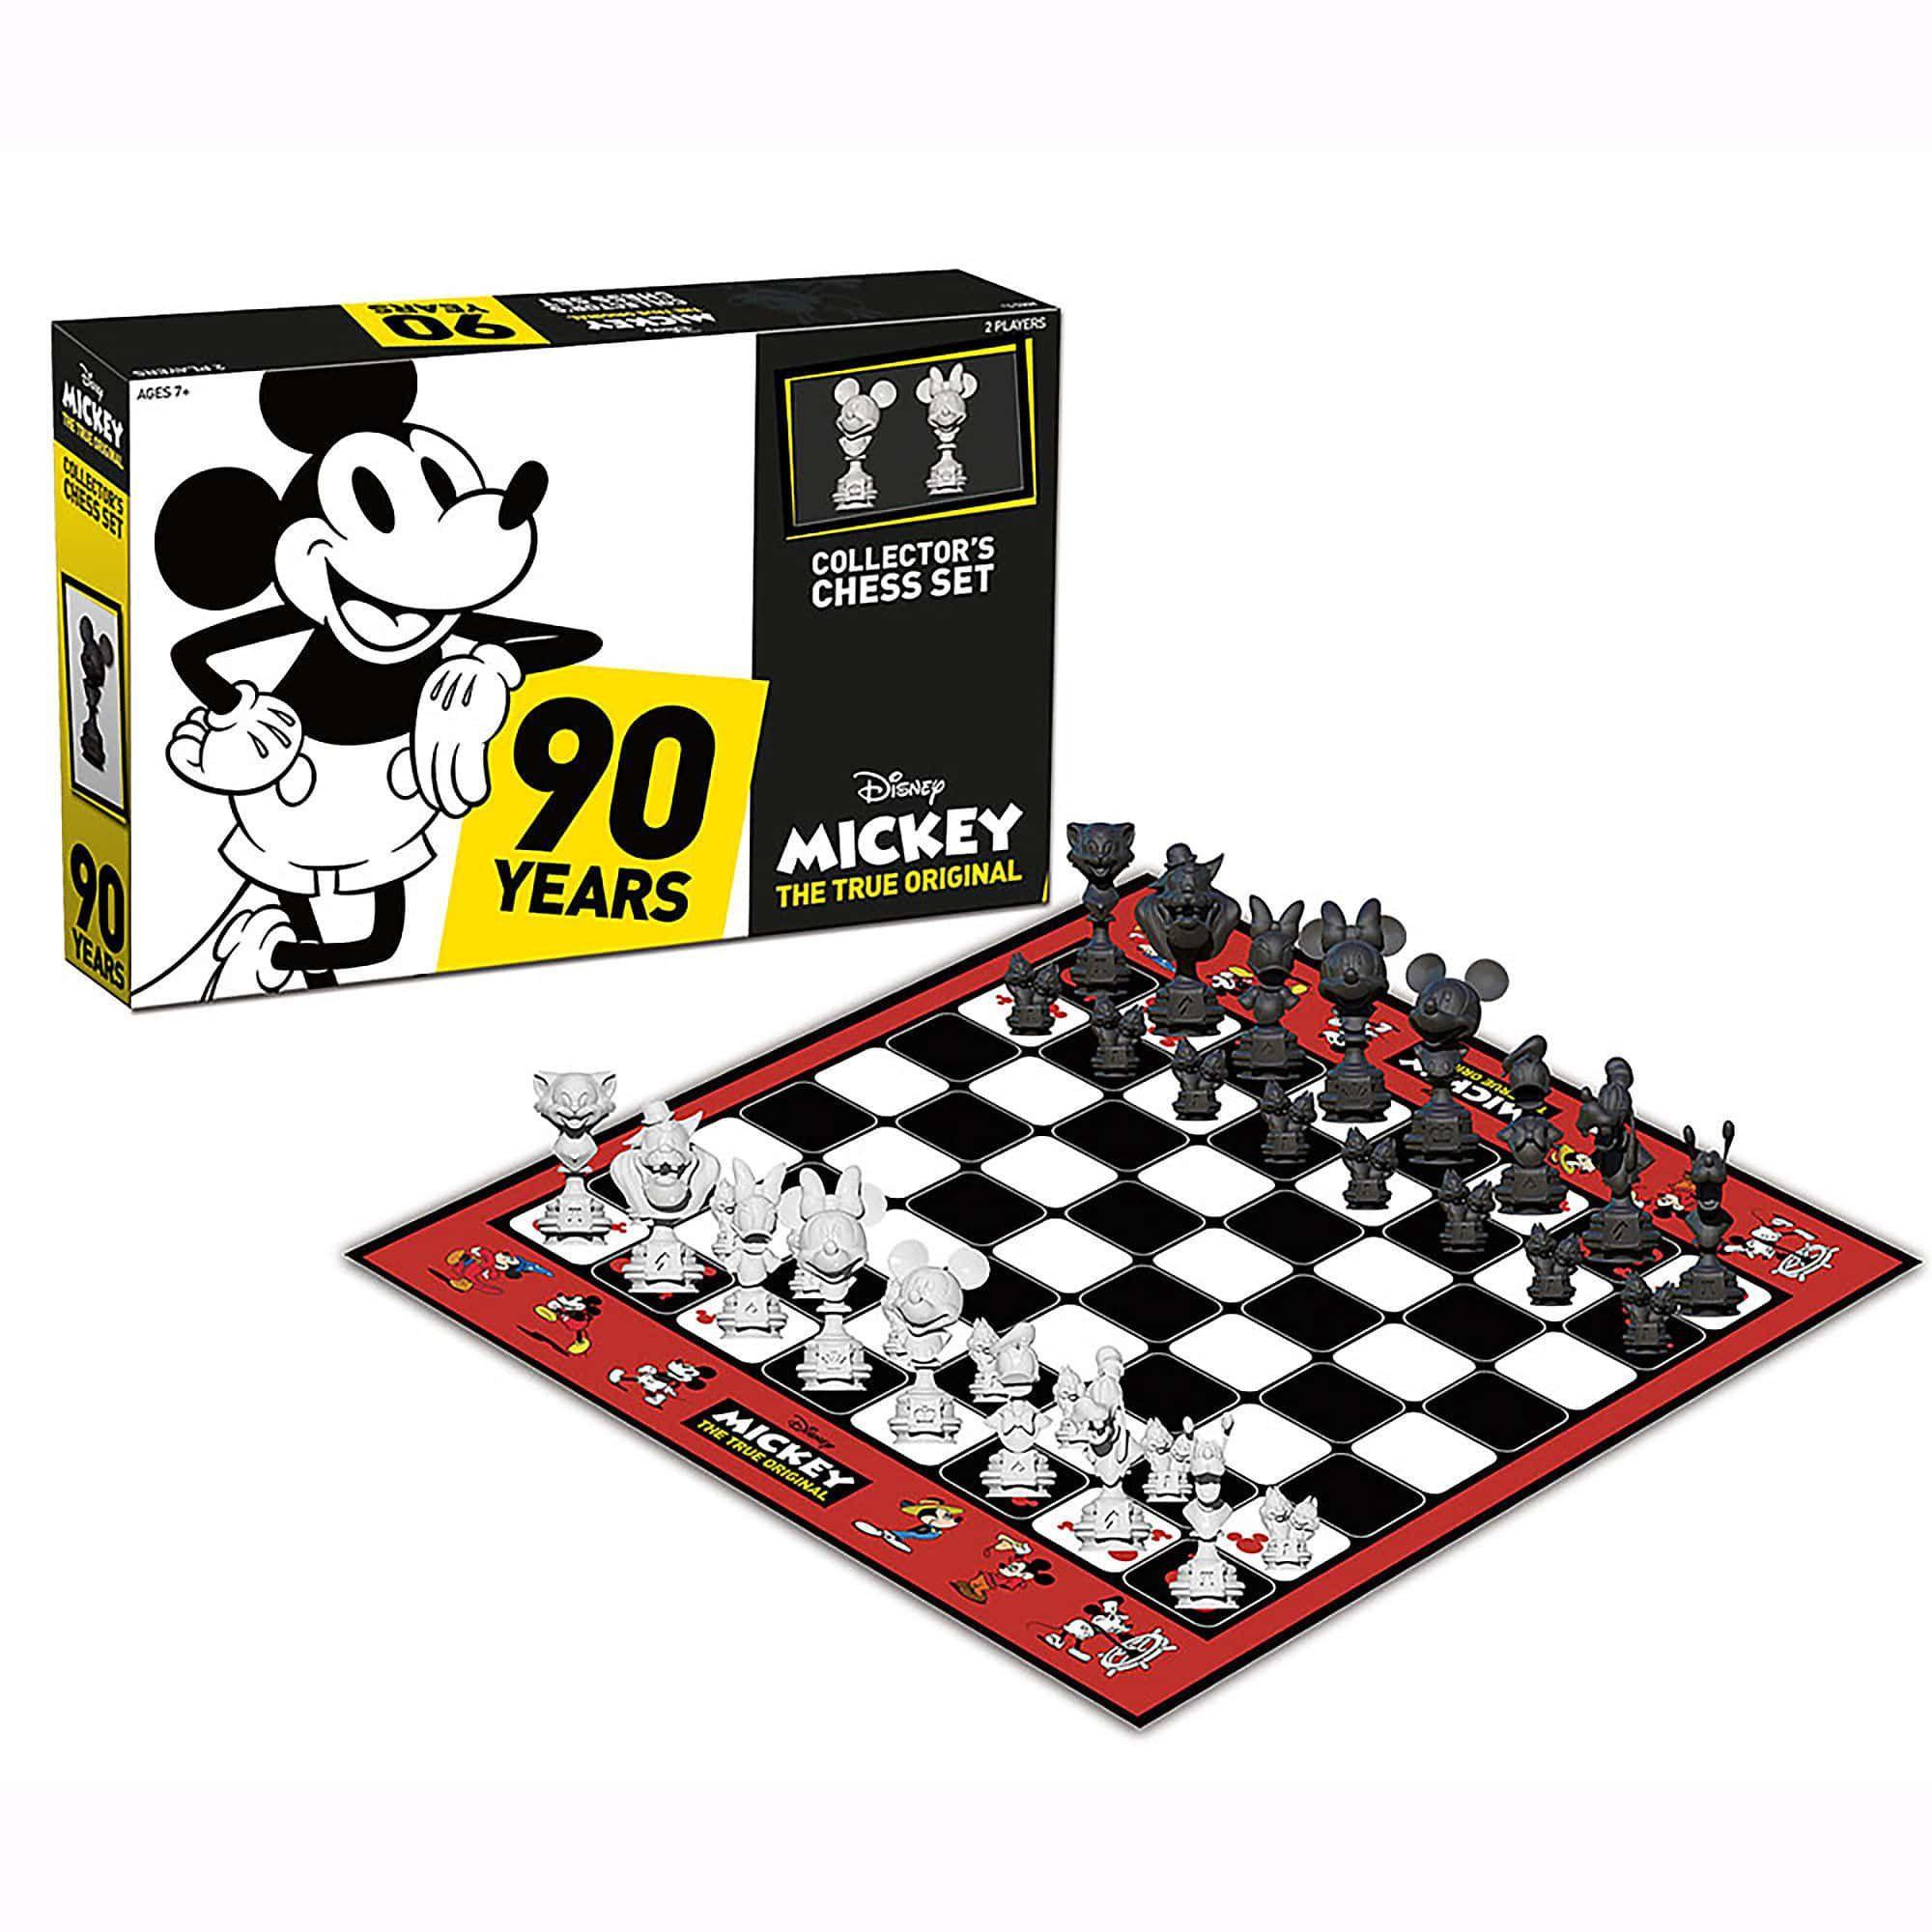 Jogo de Xadrez Mickey Mouse (Collector´s Chess Set 90th Anniversary) - Disney